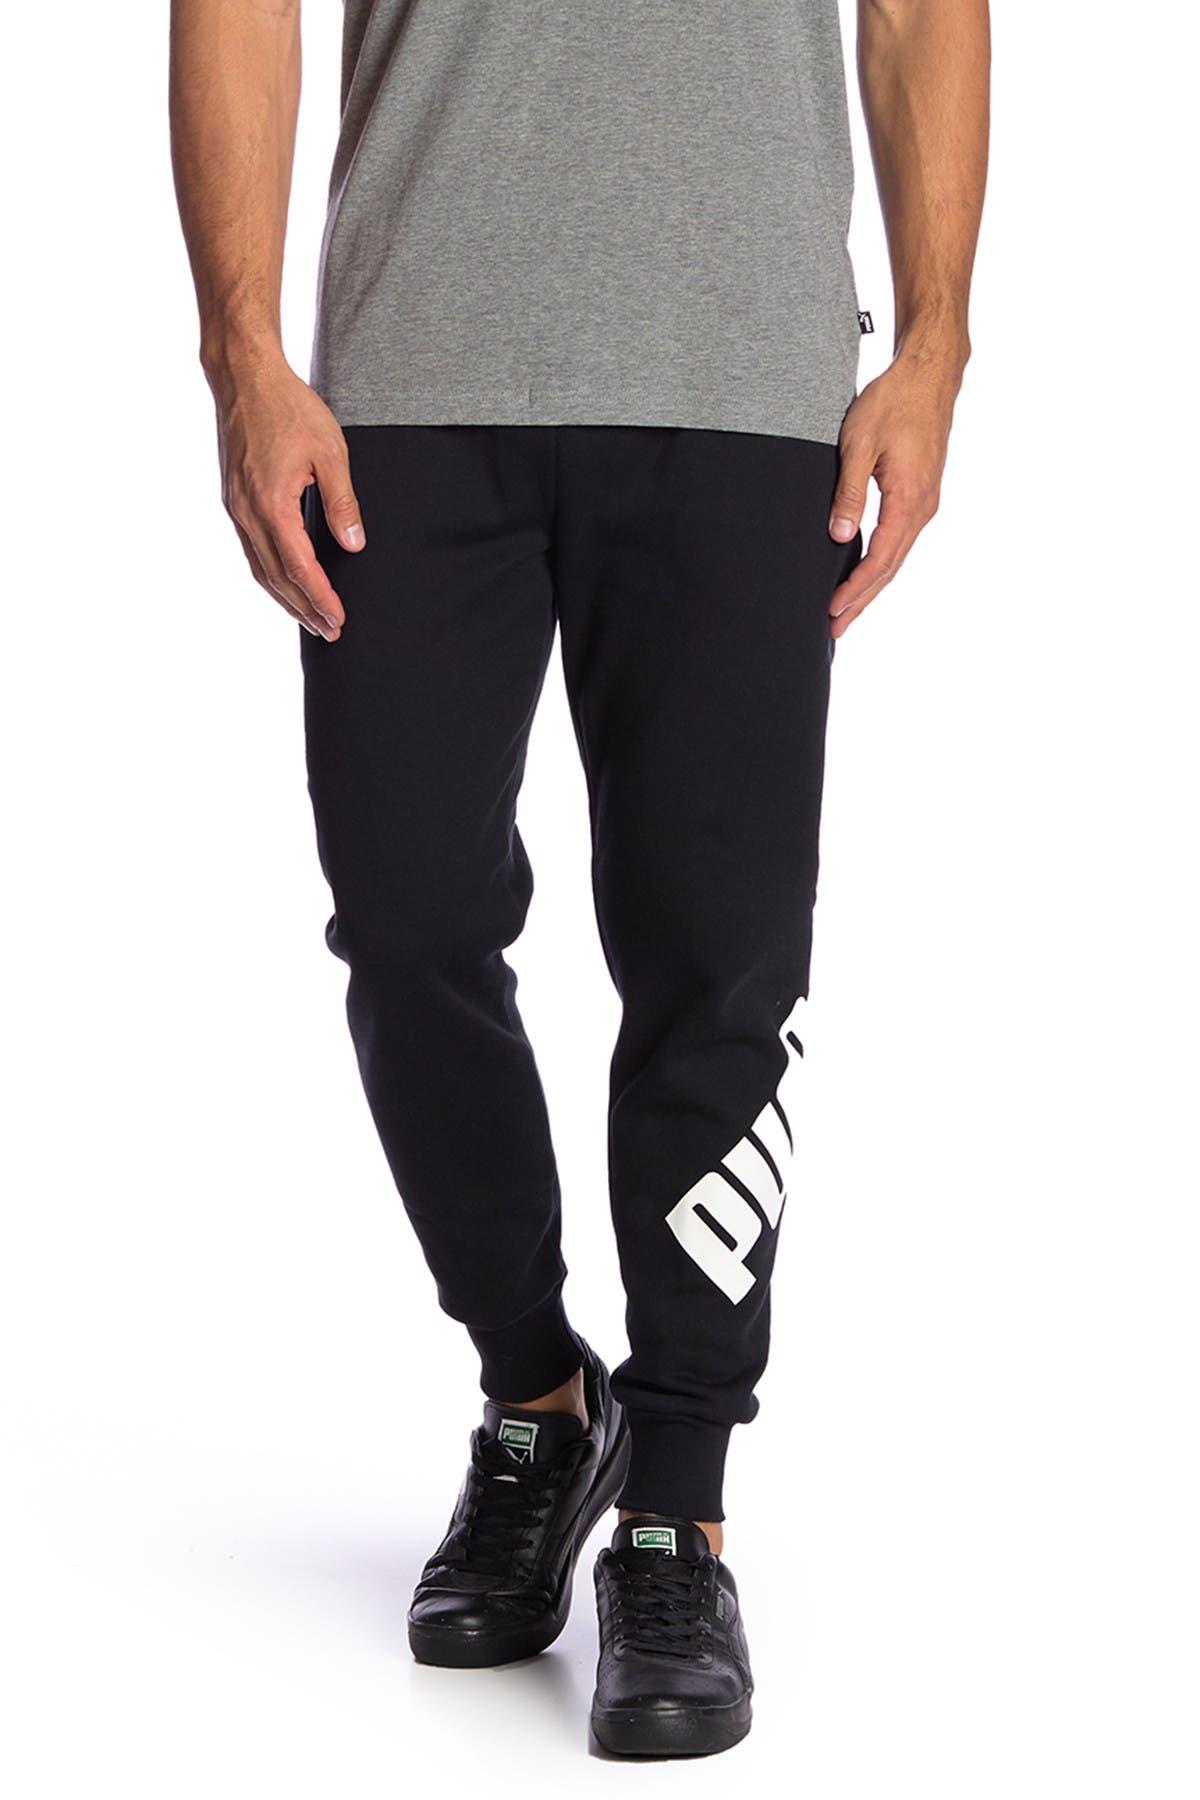 Image of PUMA Big Logo Fleece Lined Sweatpants